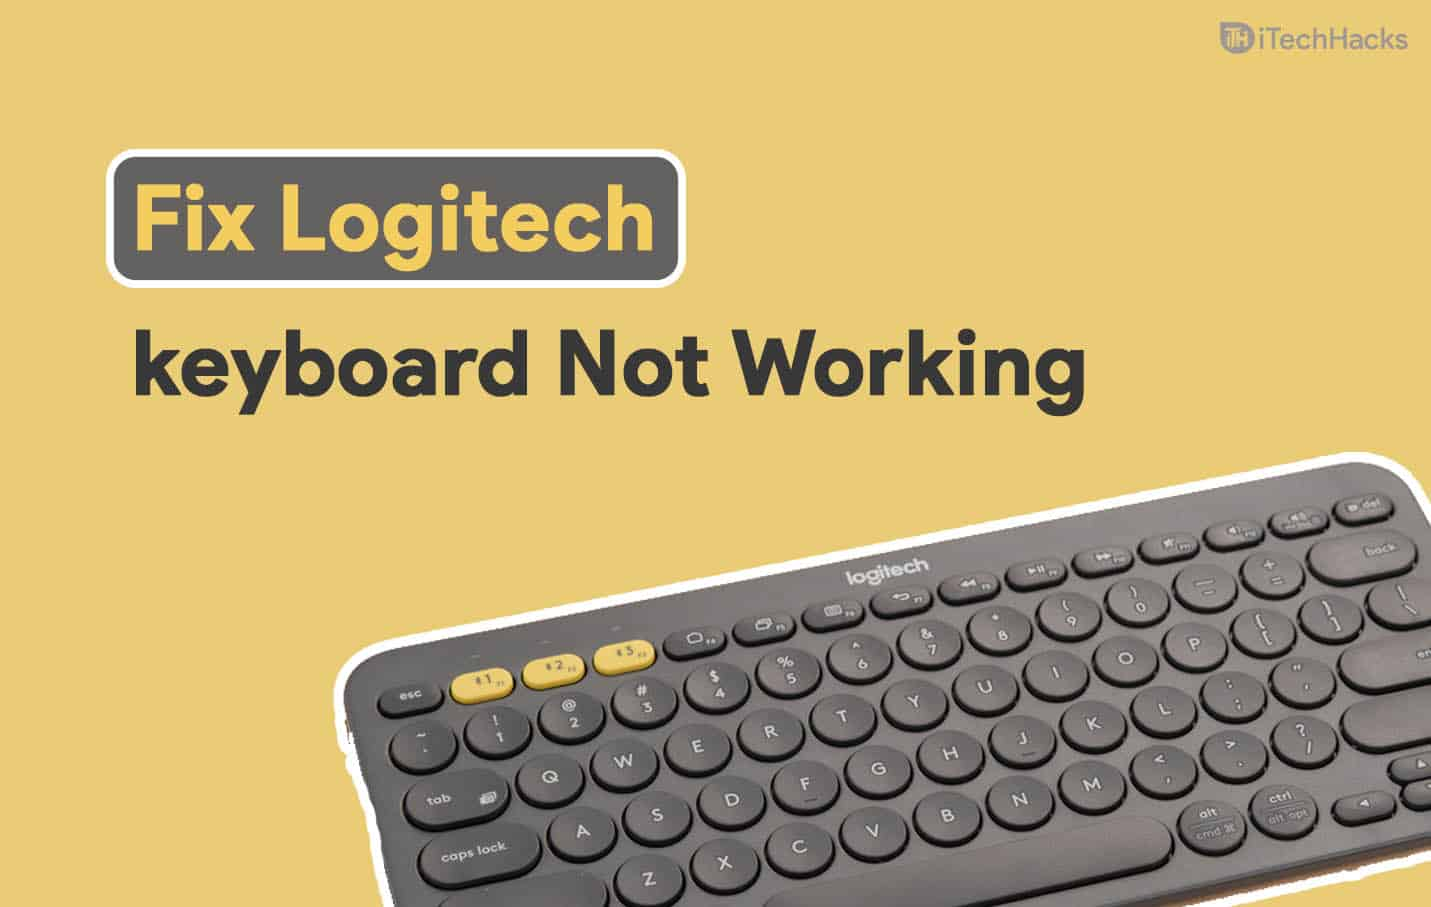 How to Fix Logitech Wireless Keyboard not Working